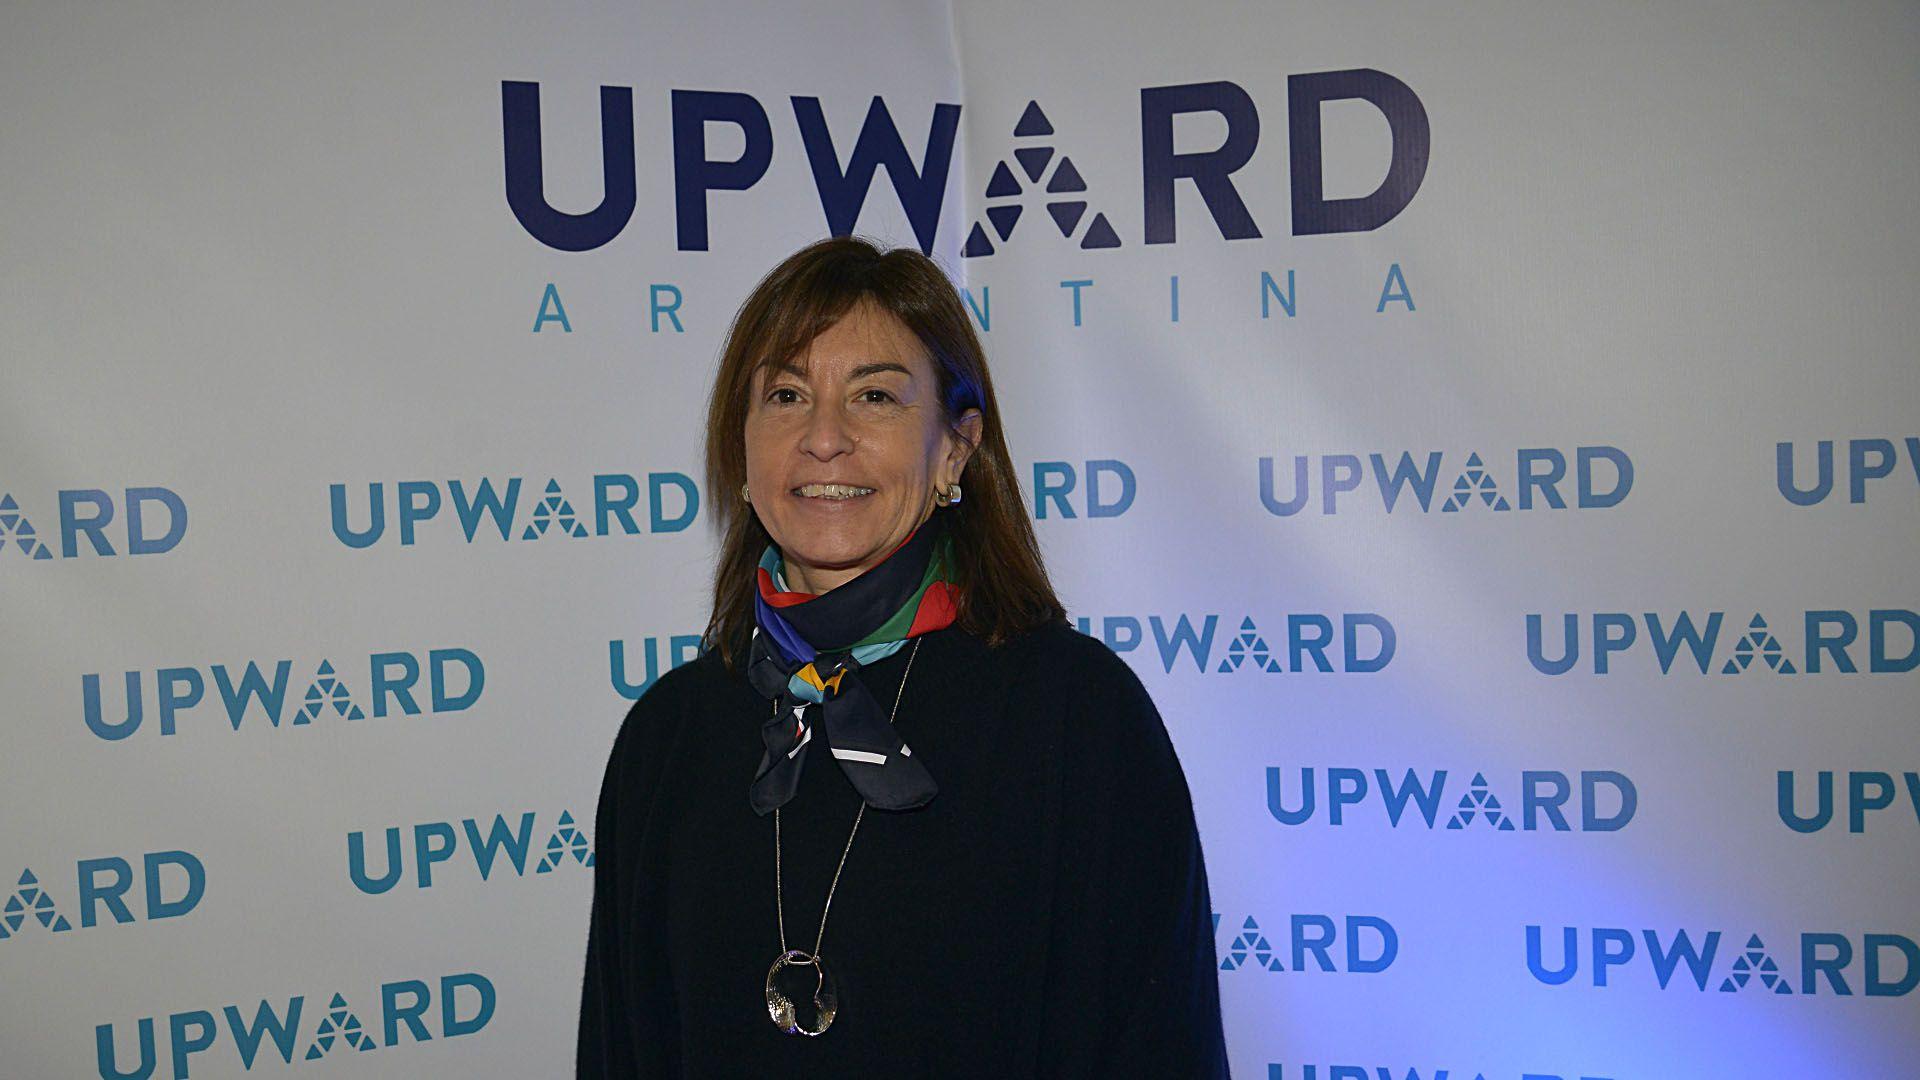 Maria Inés Baque (Secretaria de Gestión e Innovación Pública del Ministerio de Modernización de la Nación)